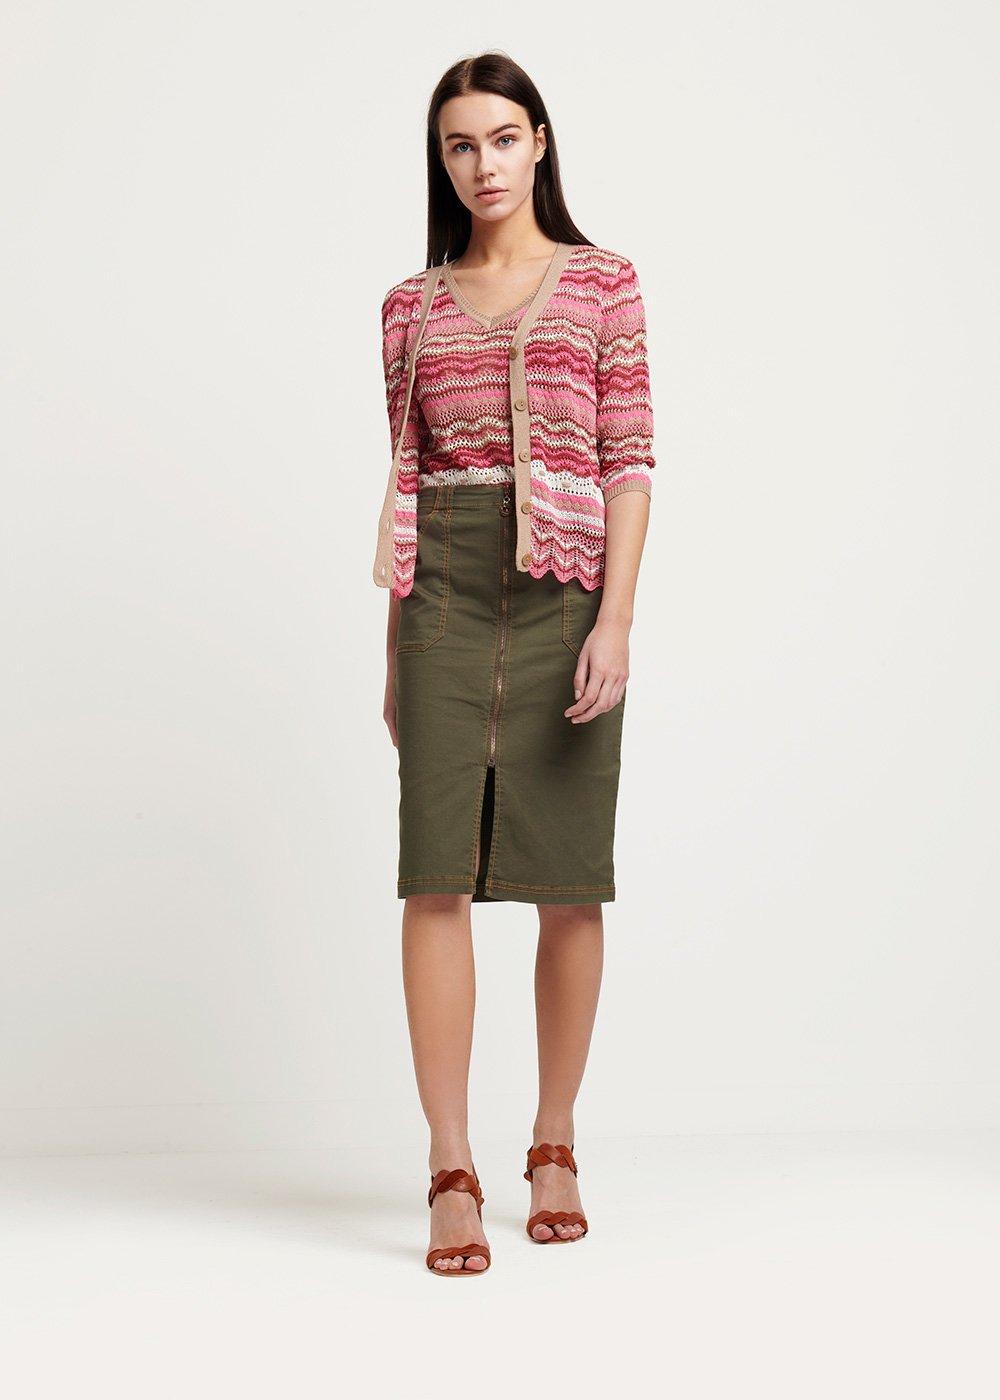 Trey cotton yarn twin set with striped pattern - Gloss \ Cacao \ Fantasia - Woman